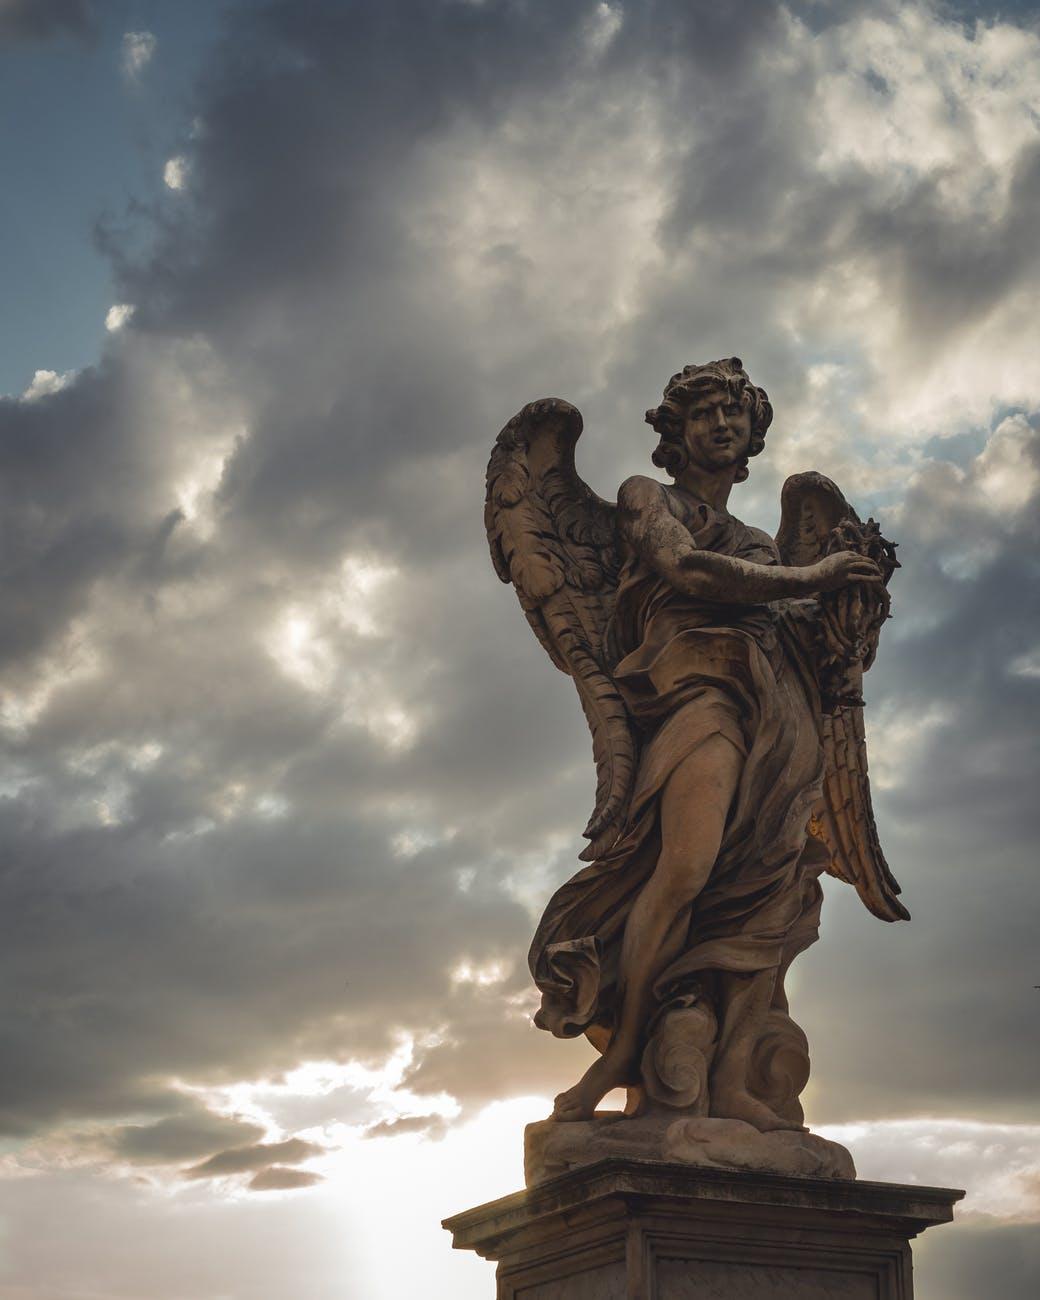 winged human statue